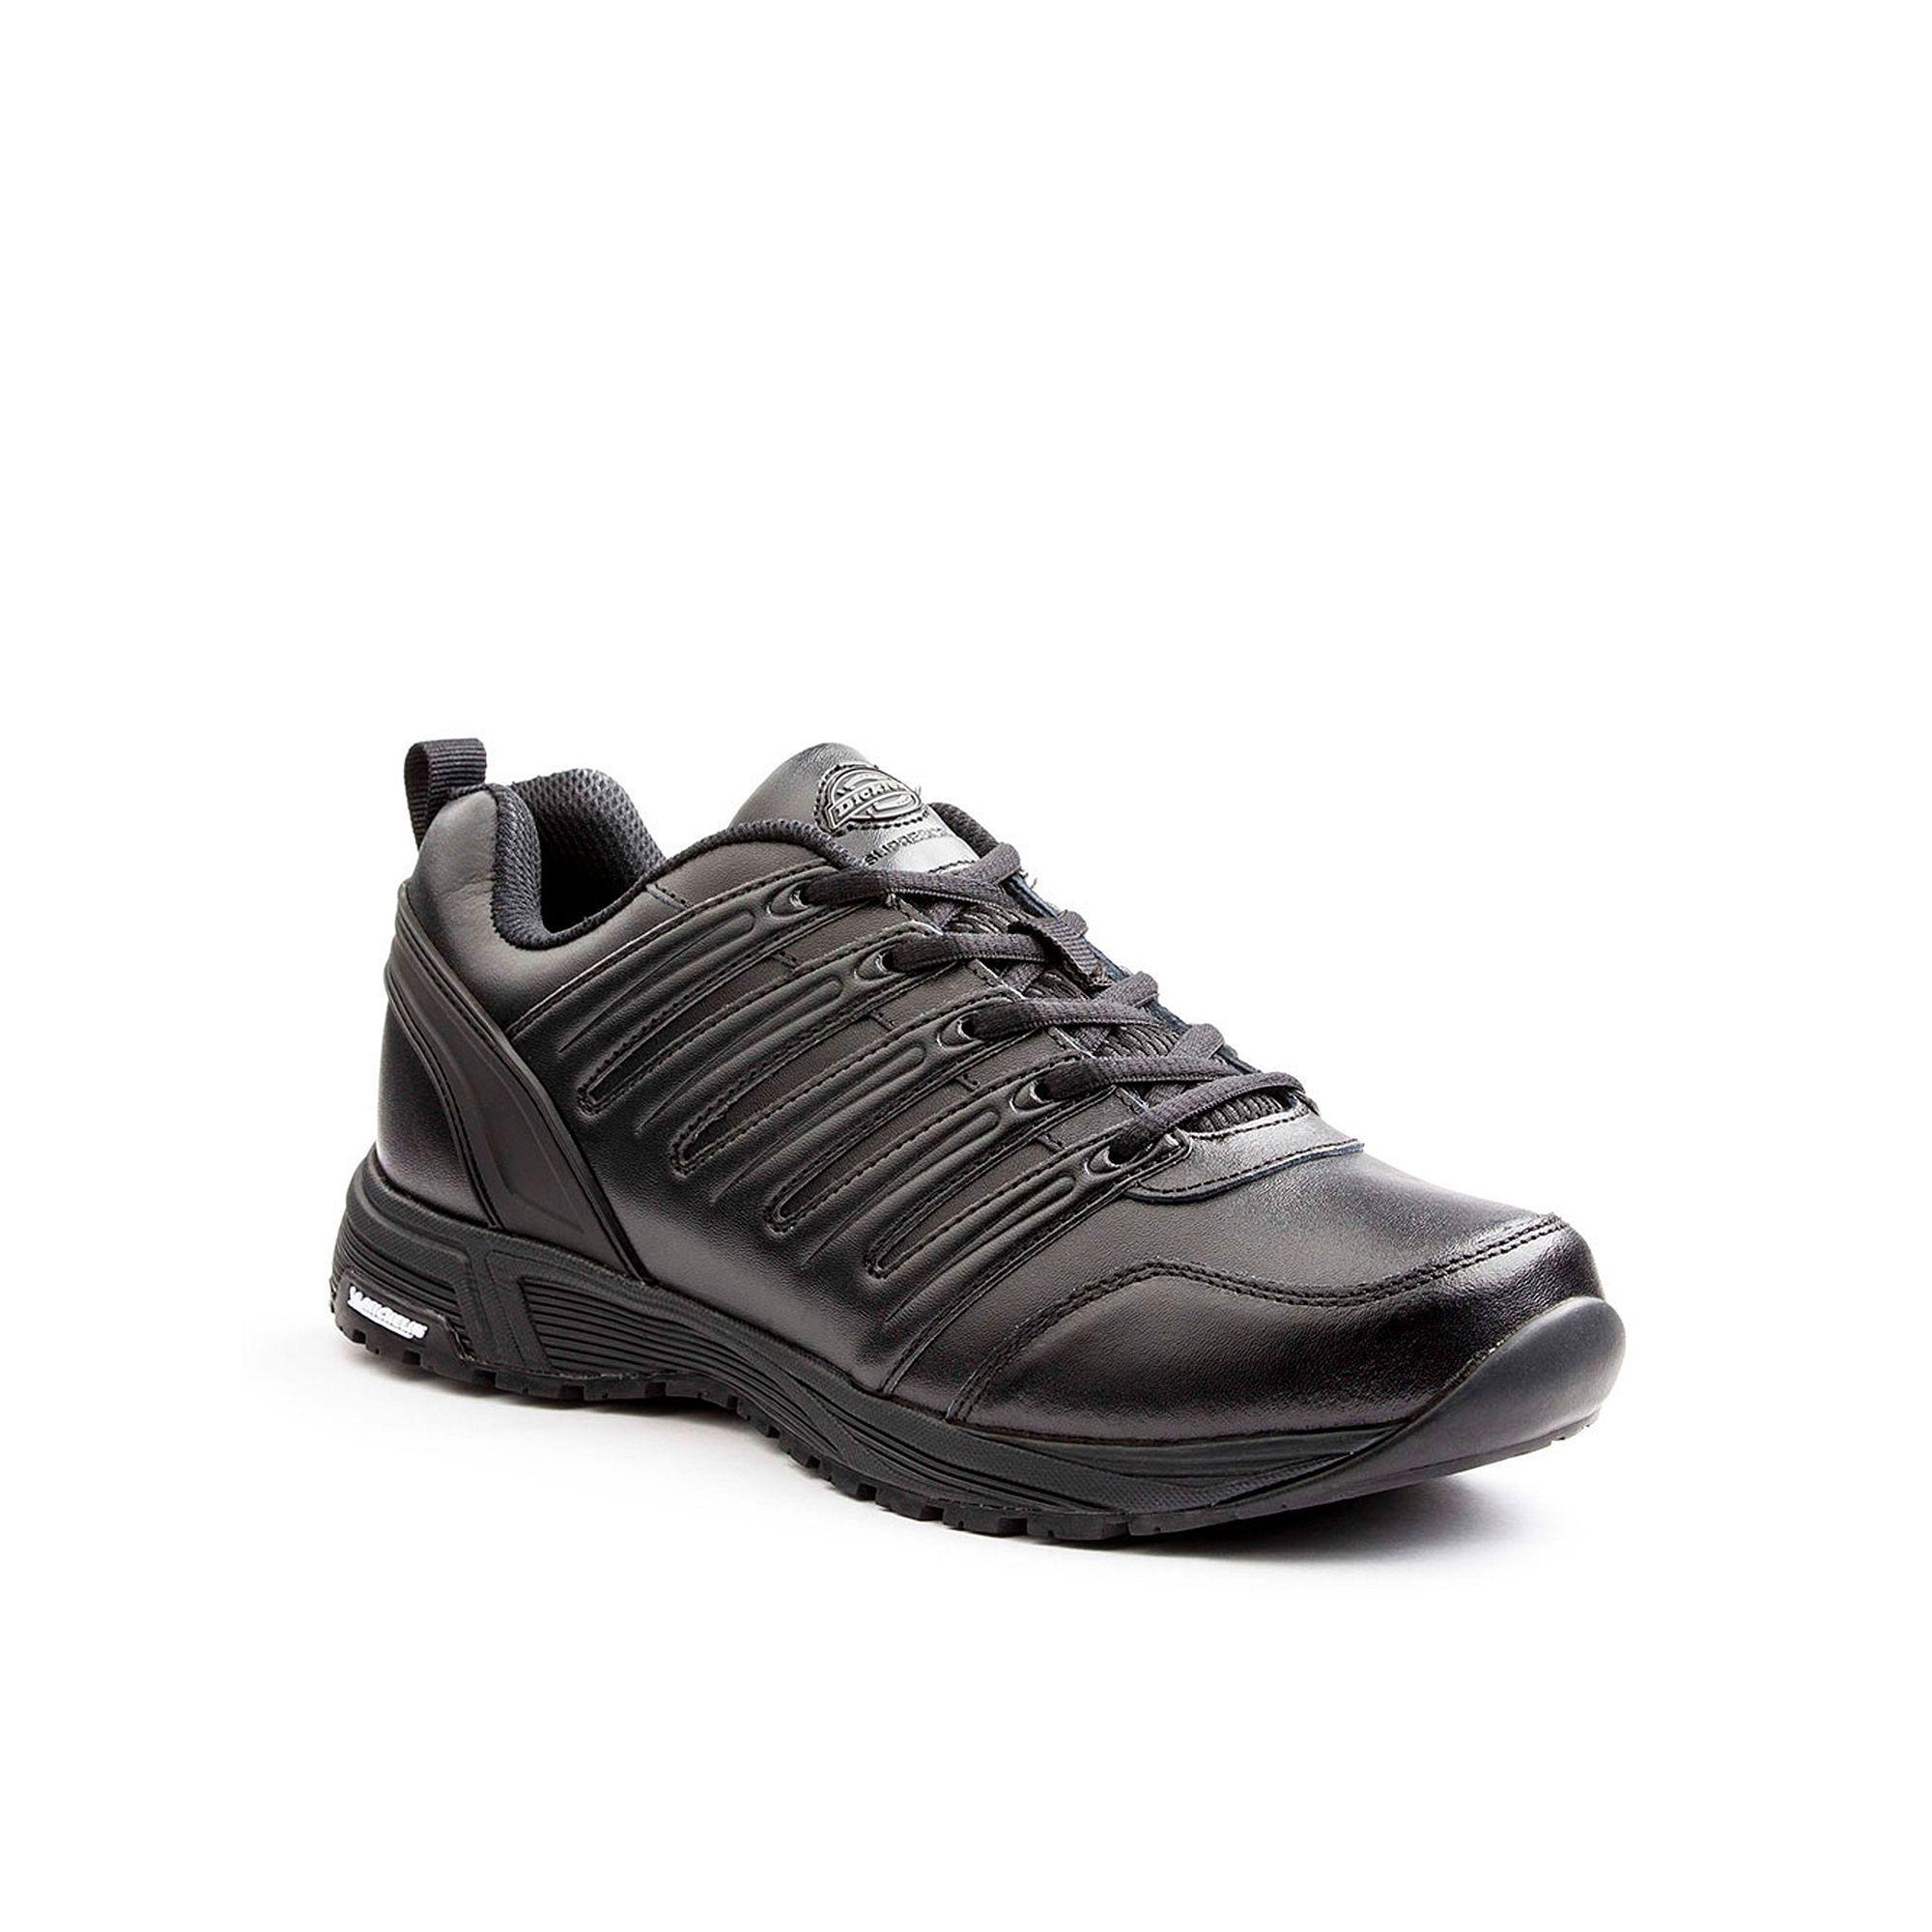 75b855c3f9c838 Dickies Apex Men s Slip-Resistant Work Shoes